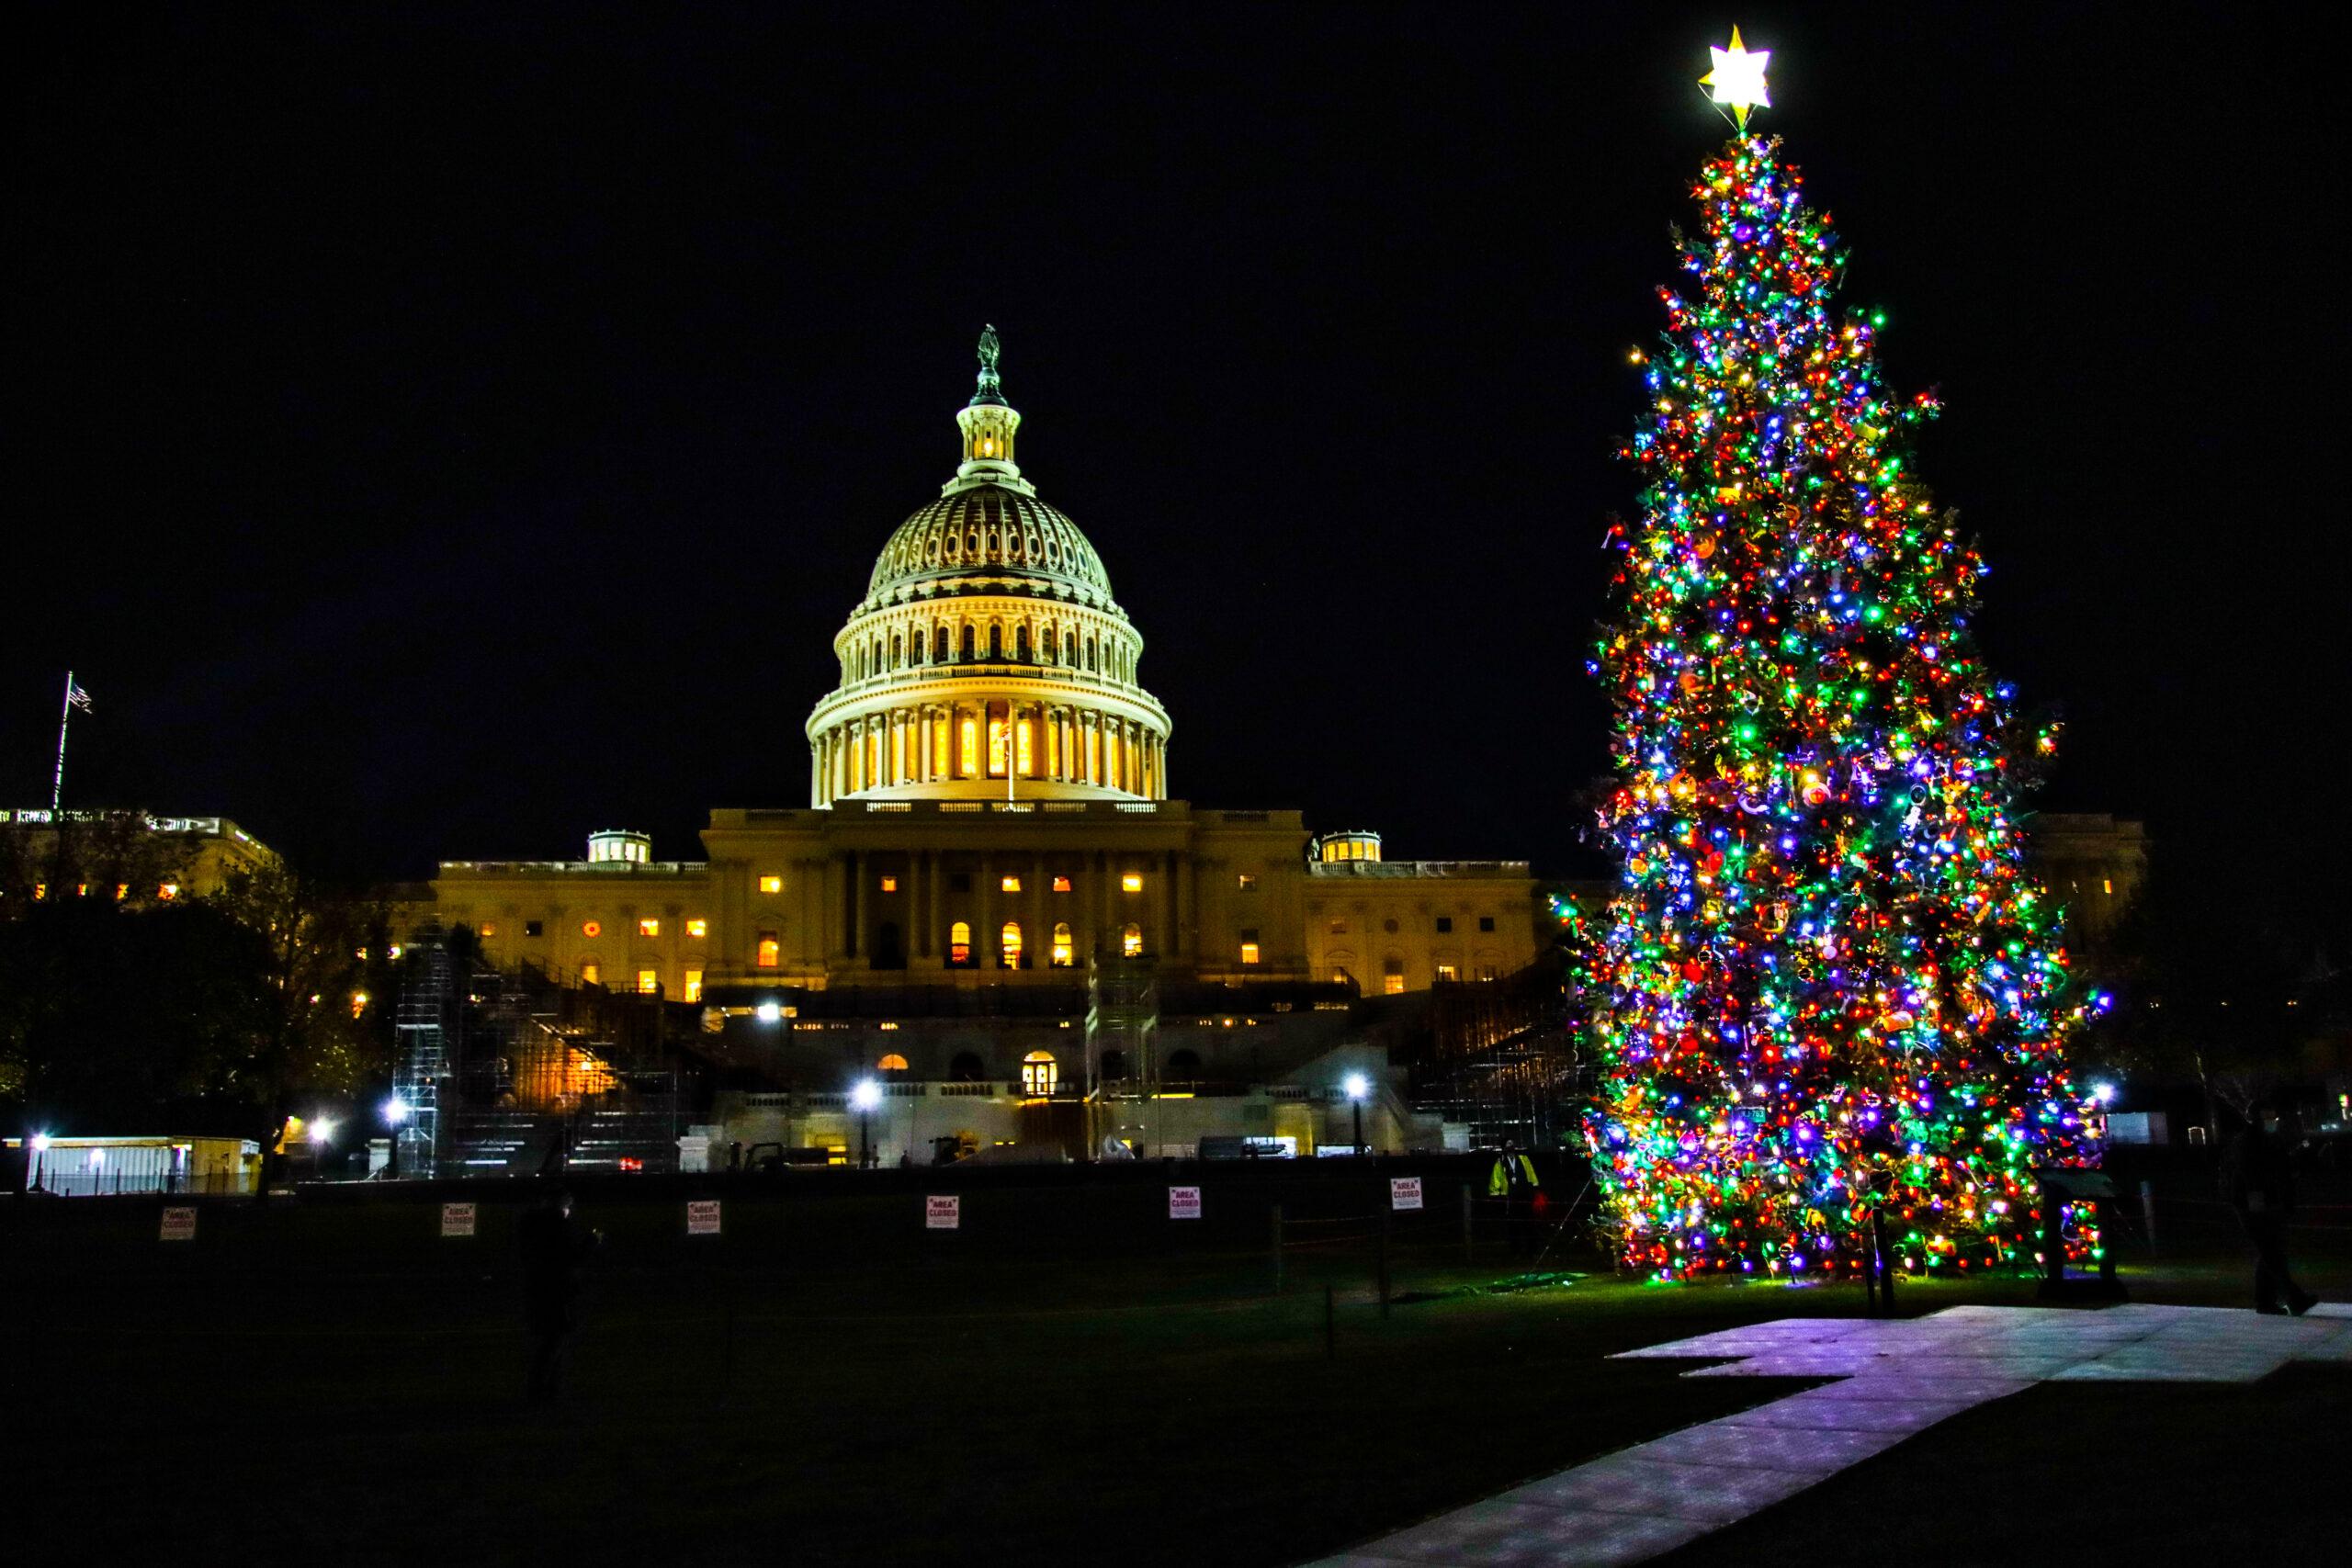 The U.S. Capitol Christmas Tree Lighting Ceremony 2020